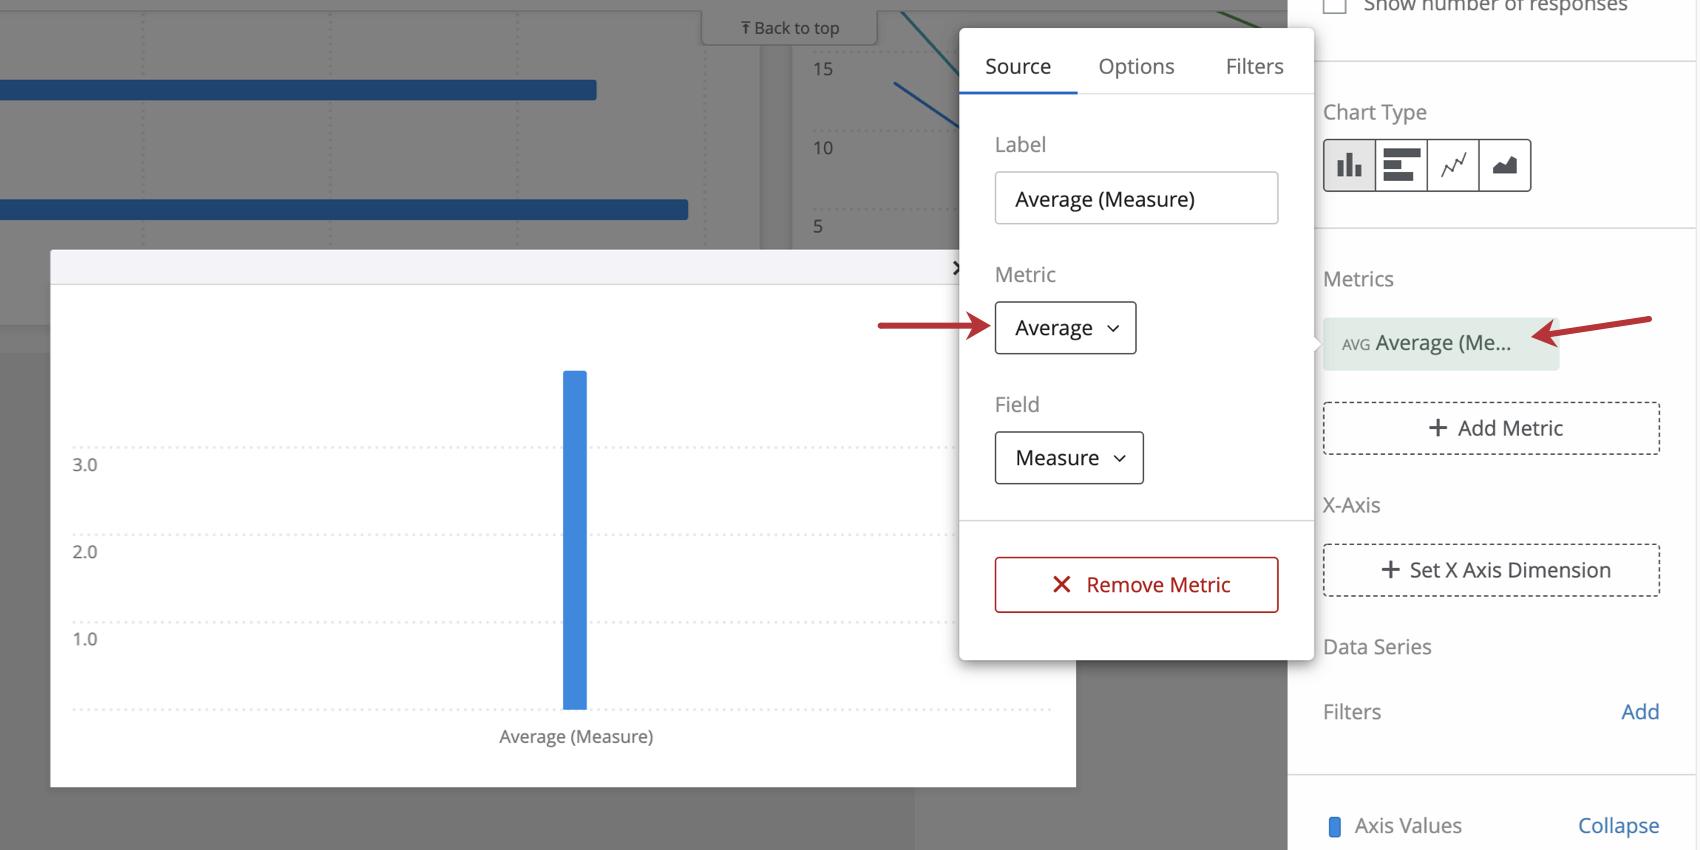 Metric settings in a bar chart